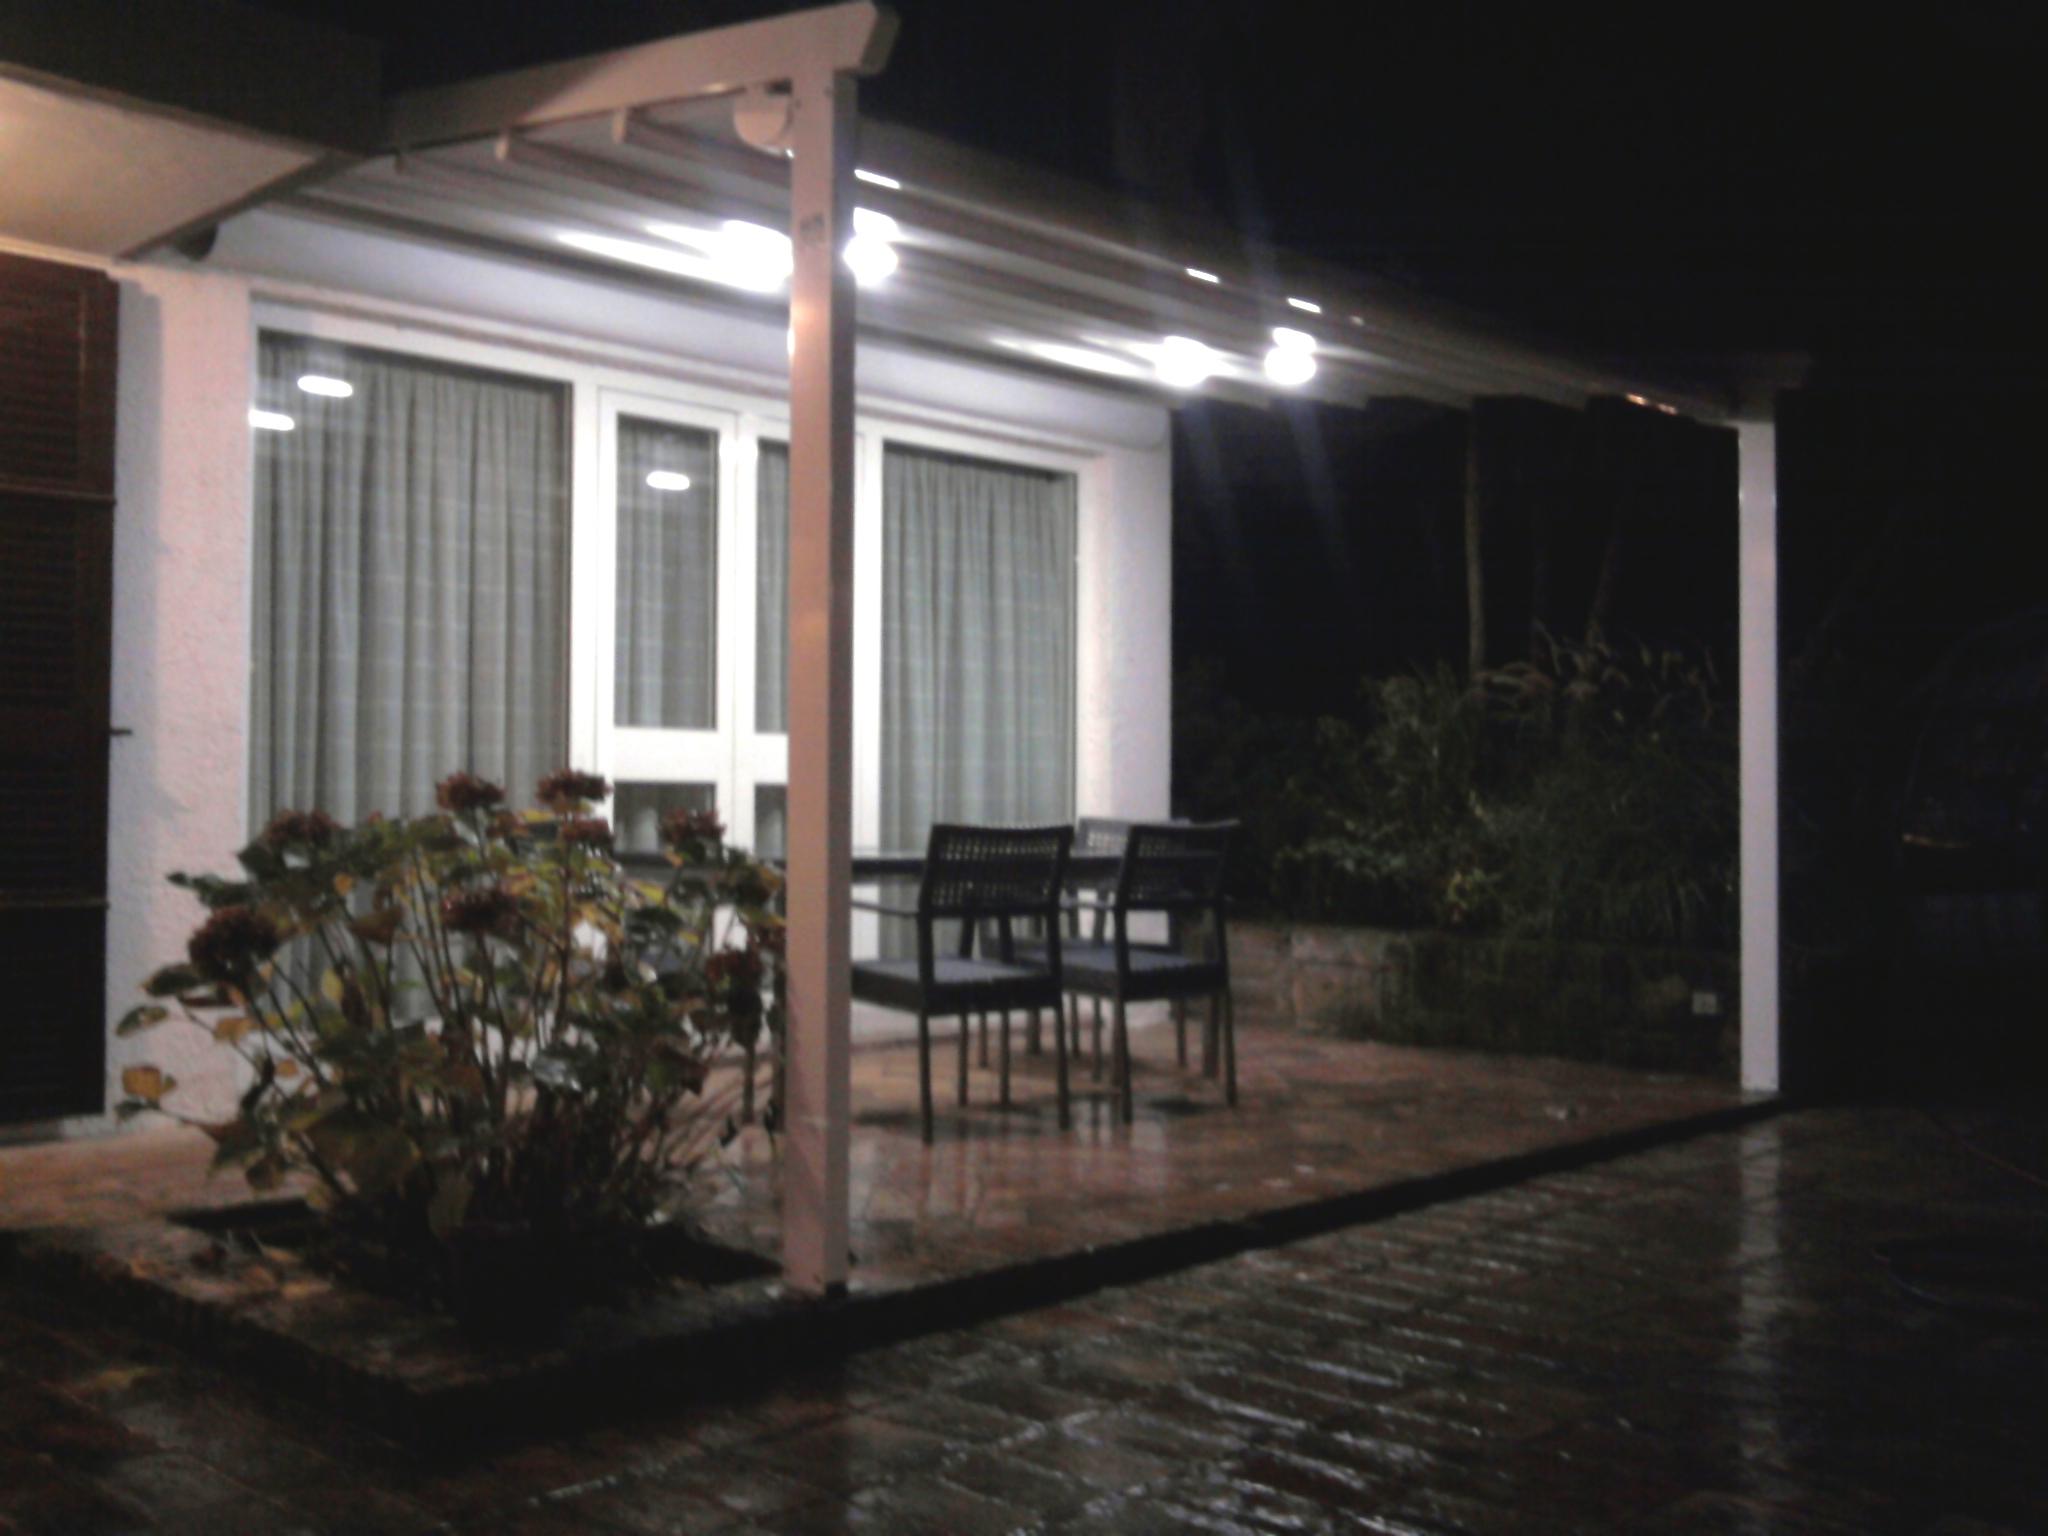 Luci da giardino offerte offerta luci da giardino a energia